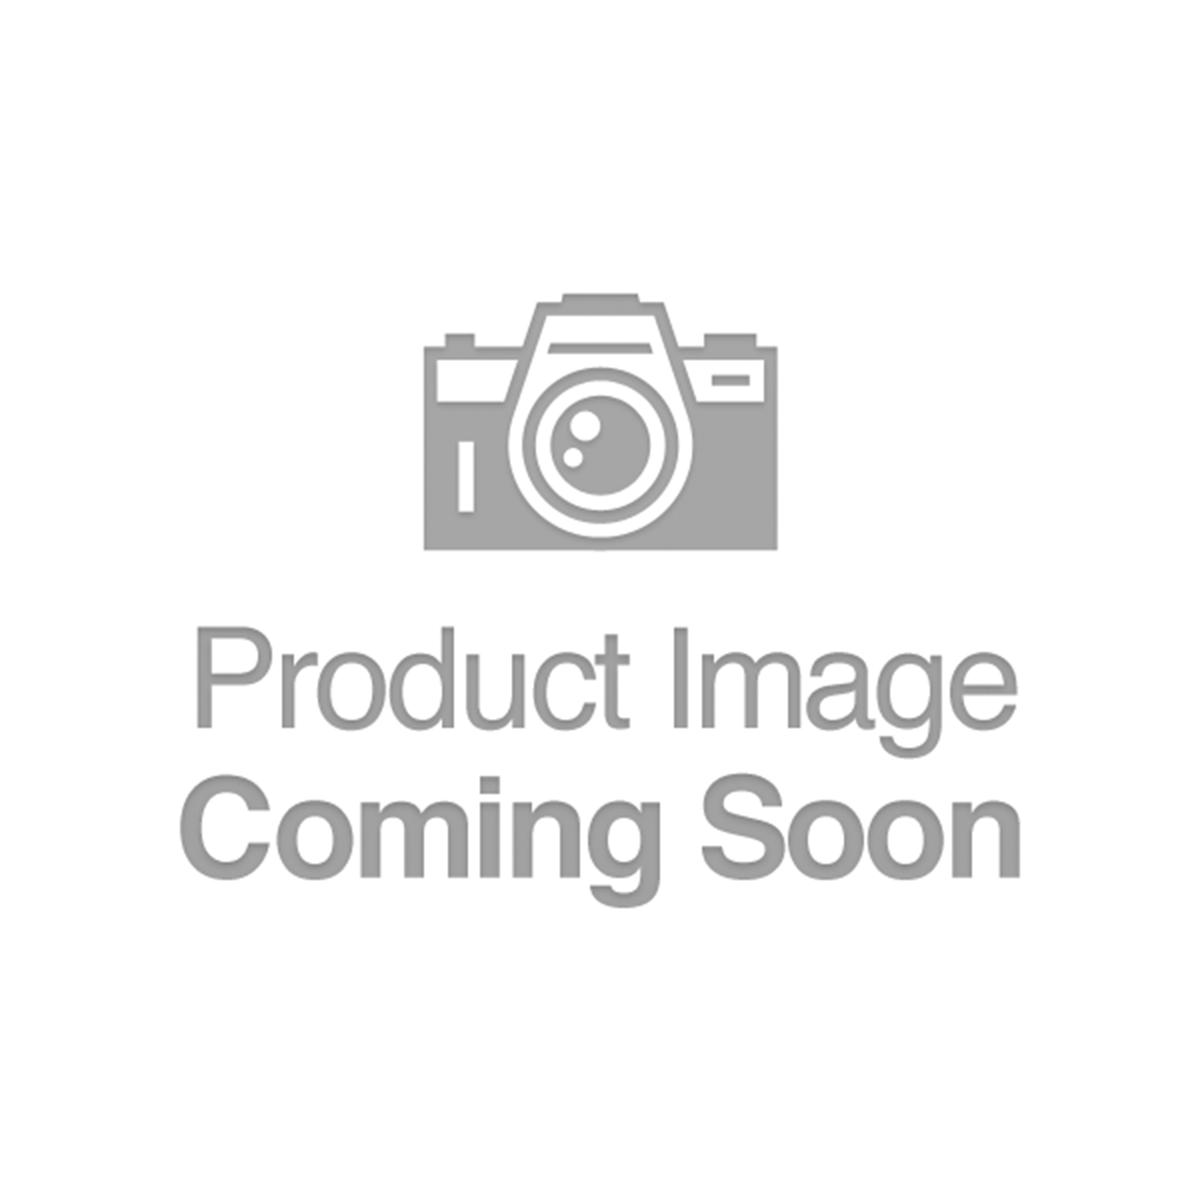 FR 281m $5 1899 Silver Certificate PMG 65 EPQ